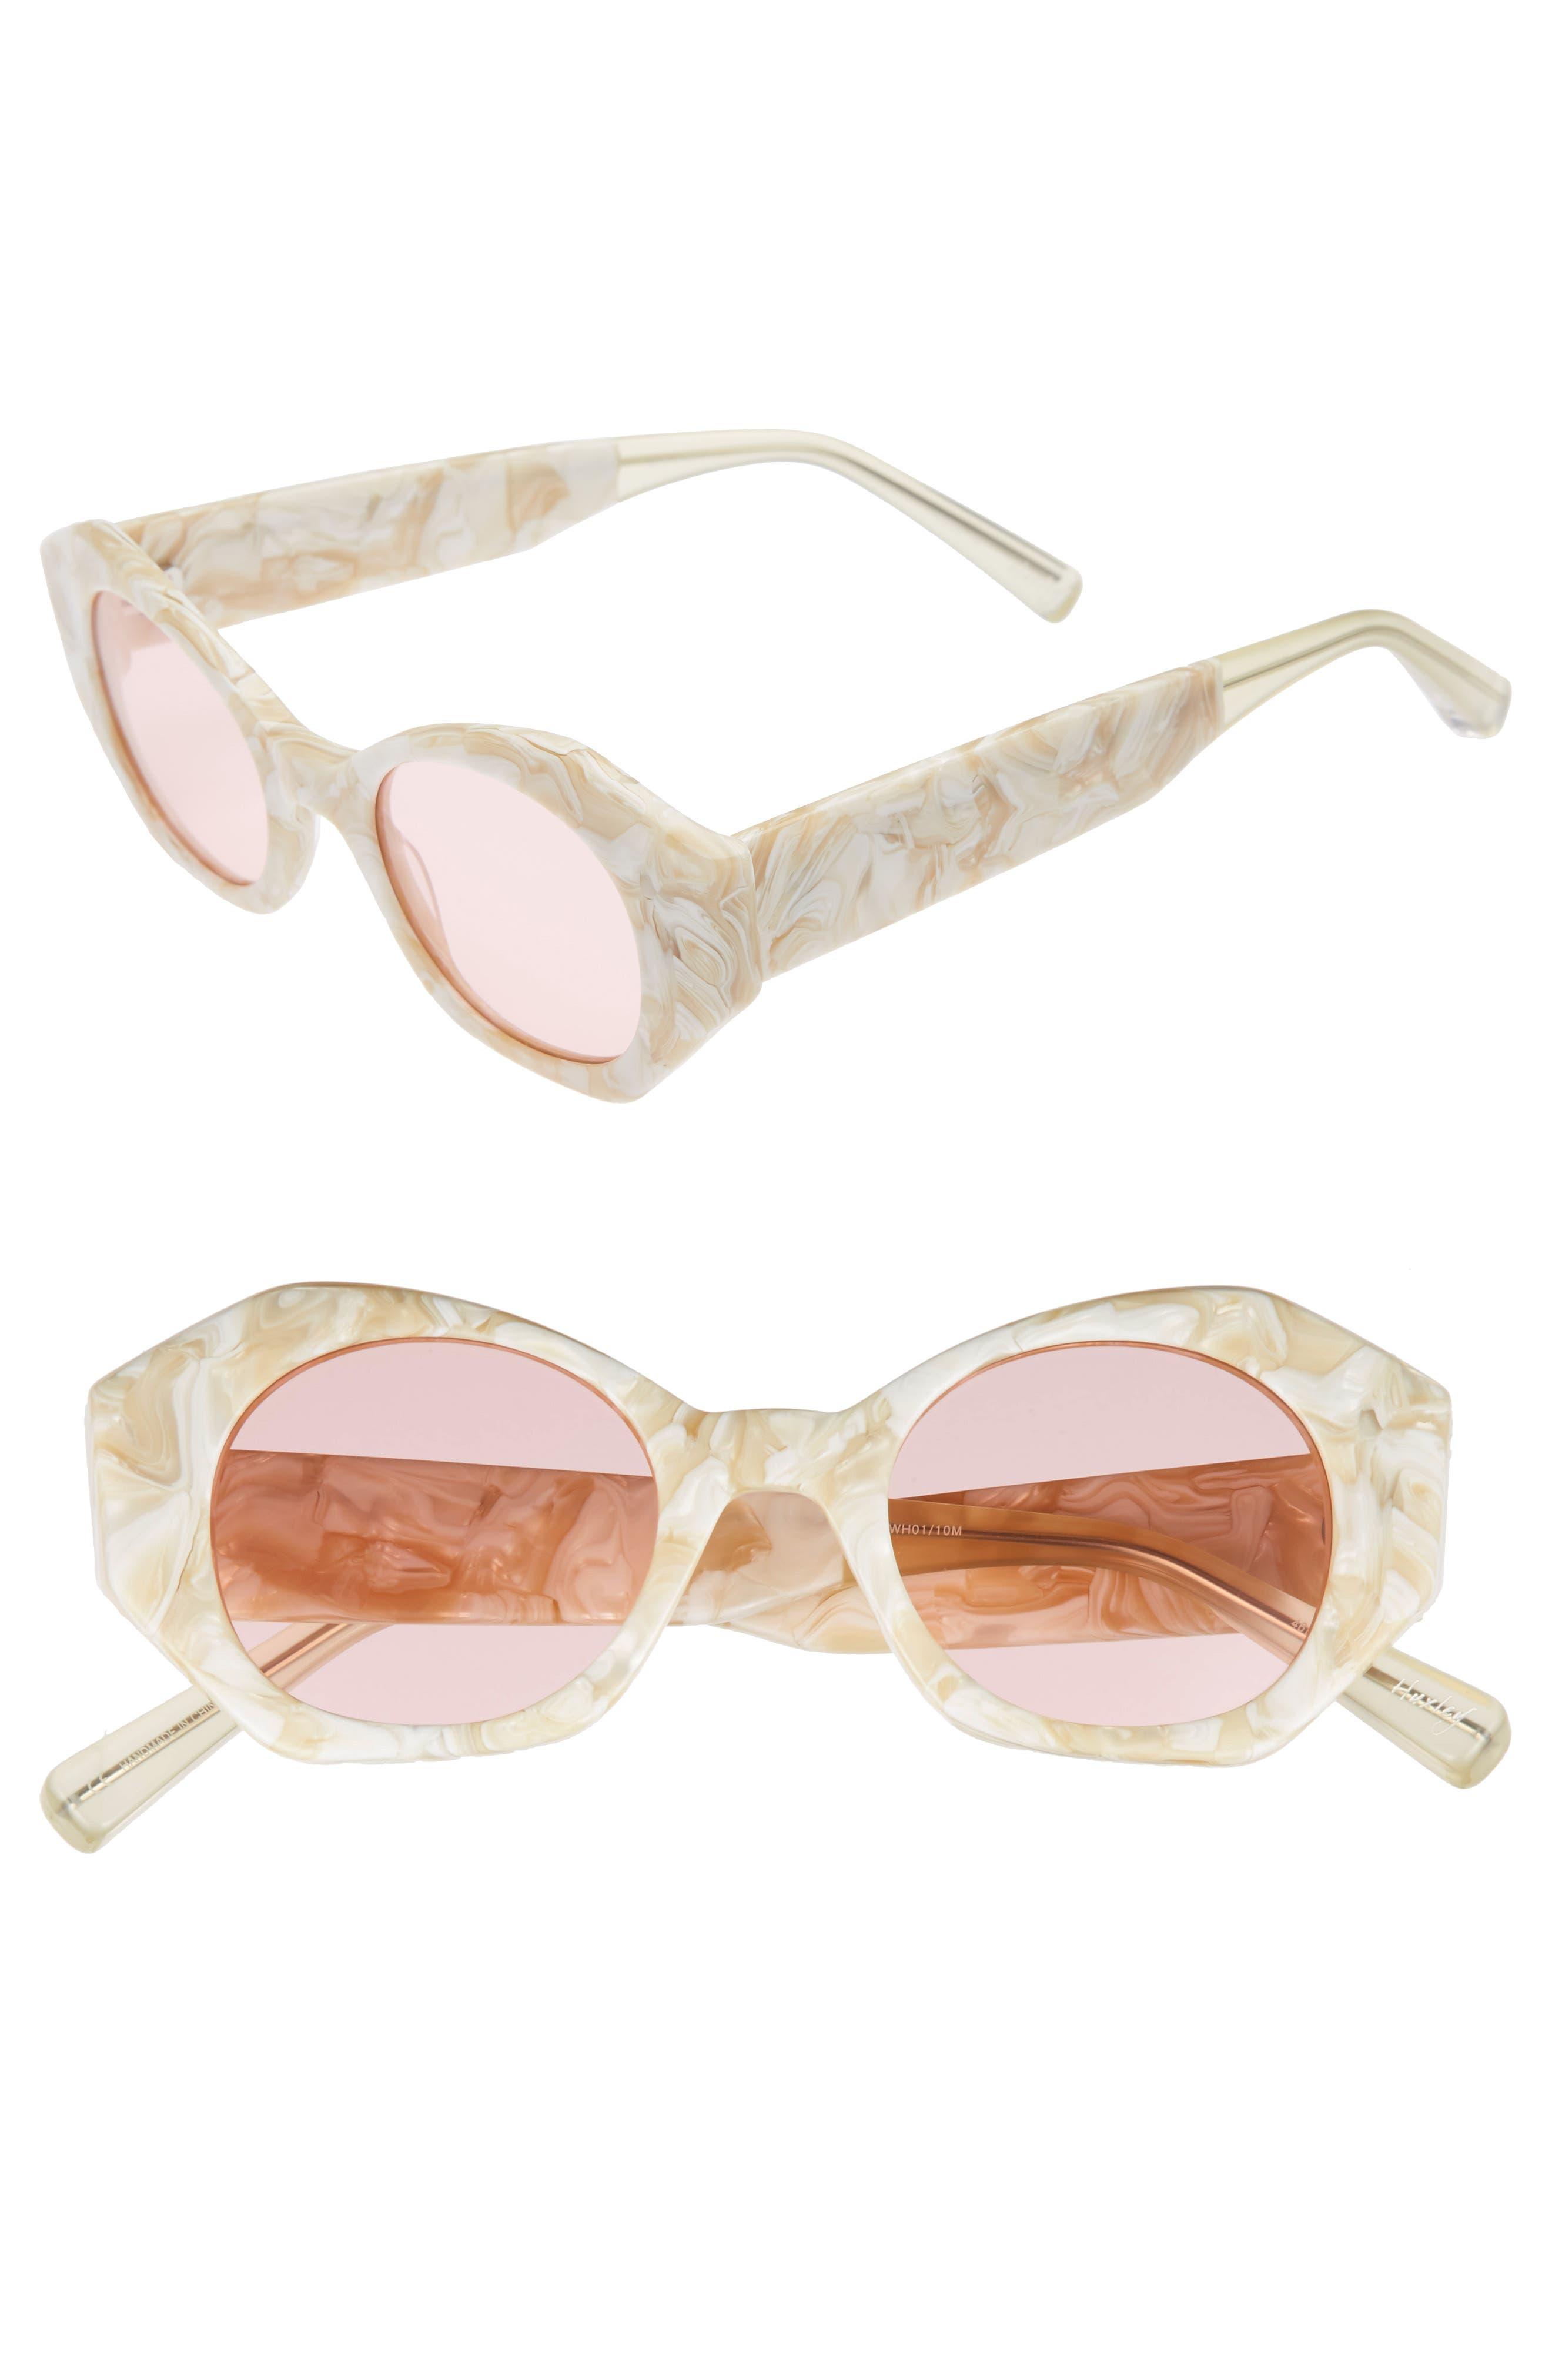 Elizabeth and James Huxley 46mm Geometric Sunglasses